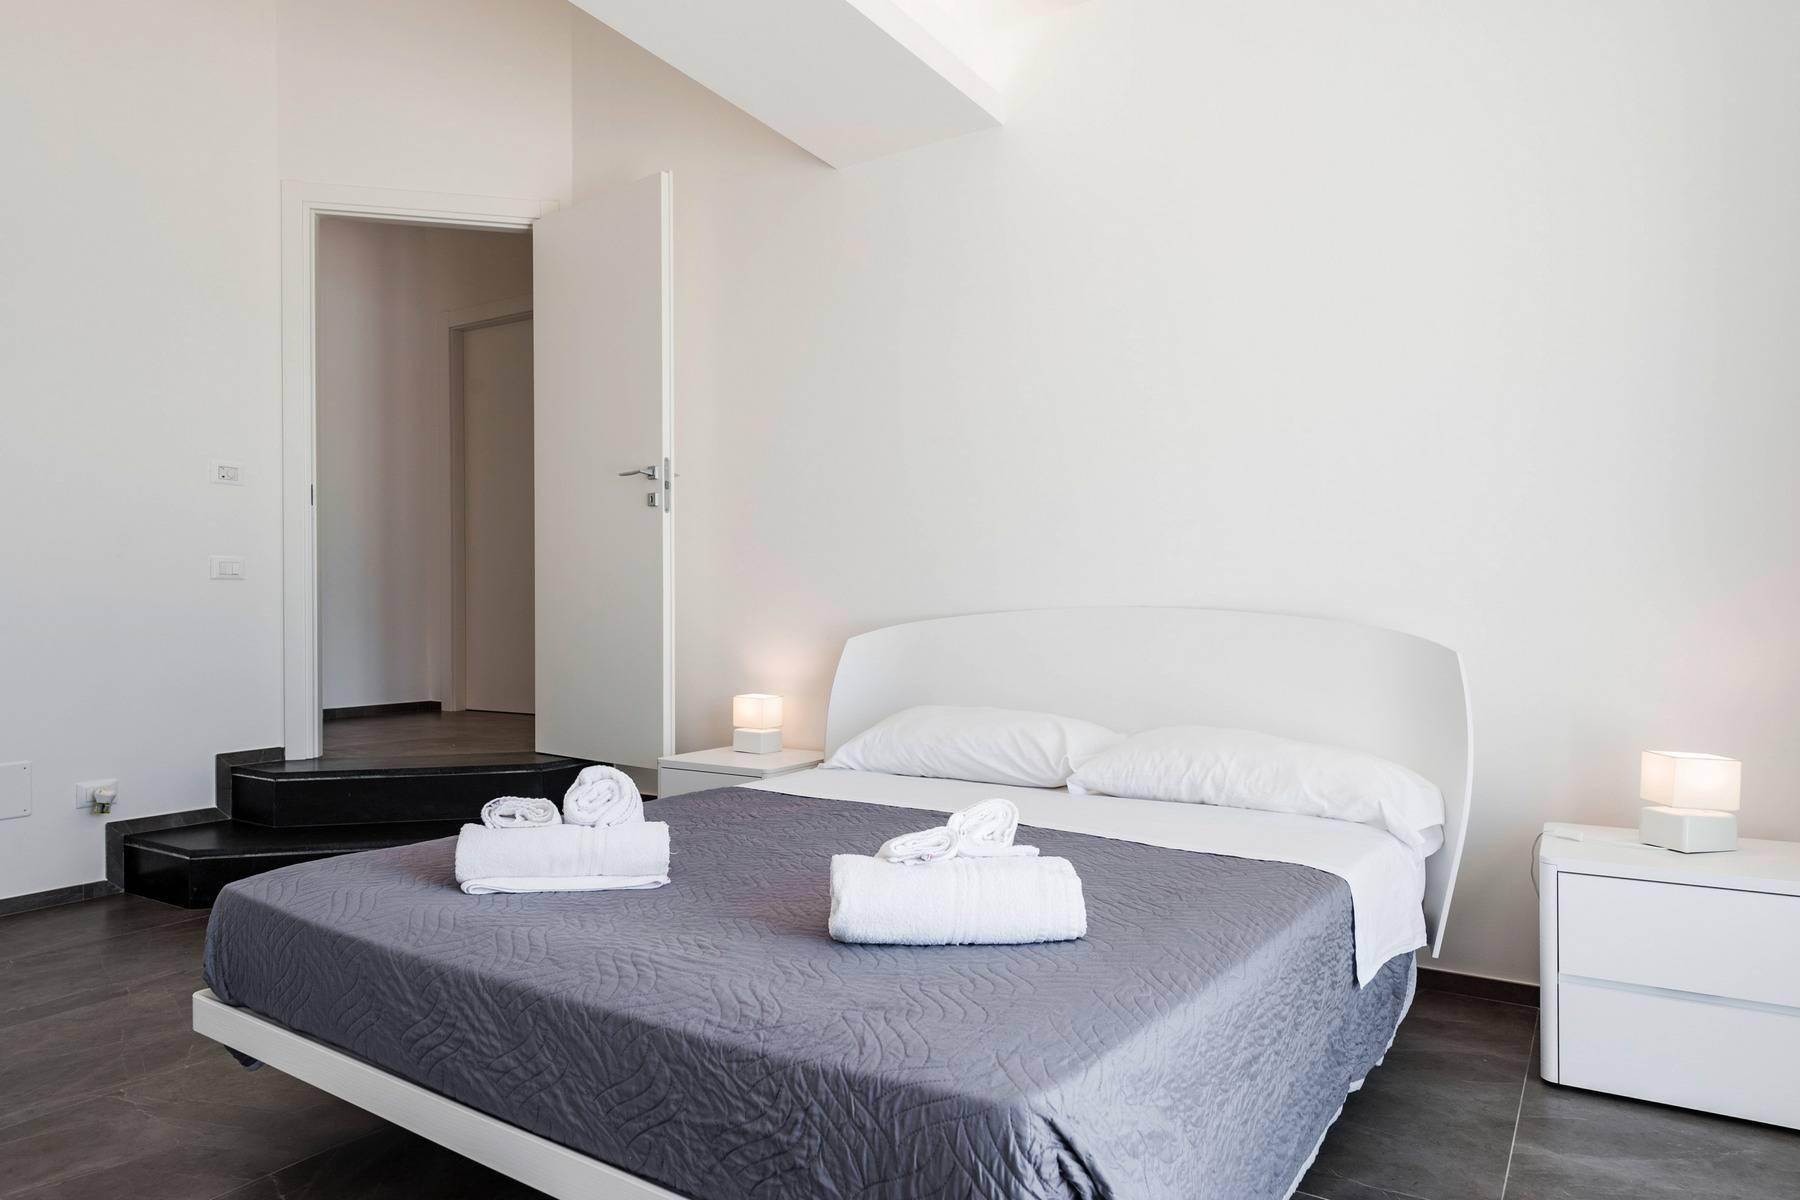 Exclusive villa with sea view in Avola - 11